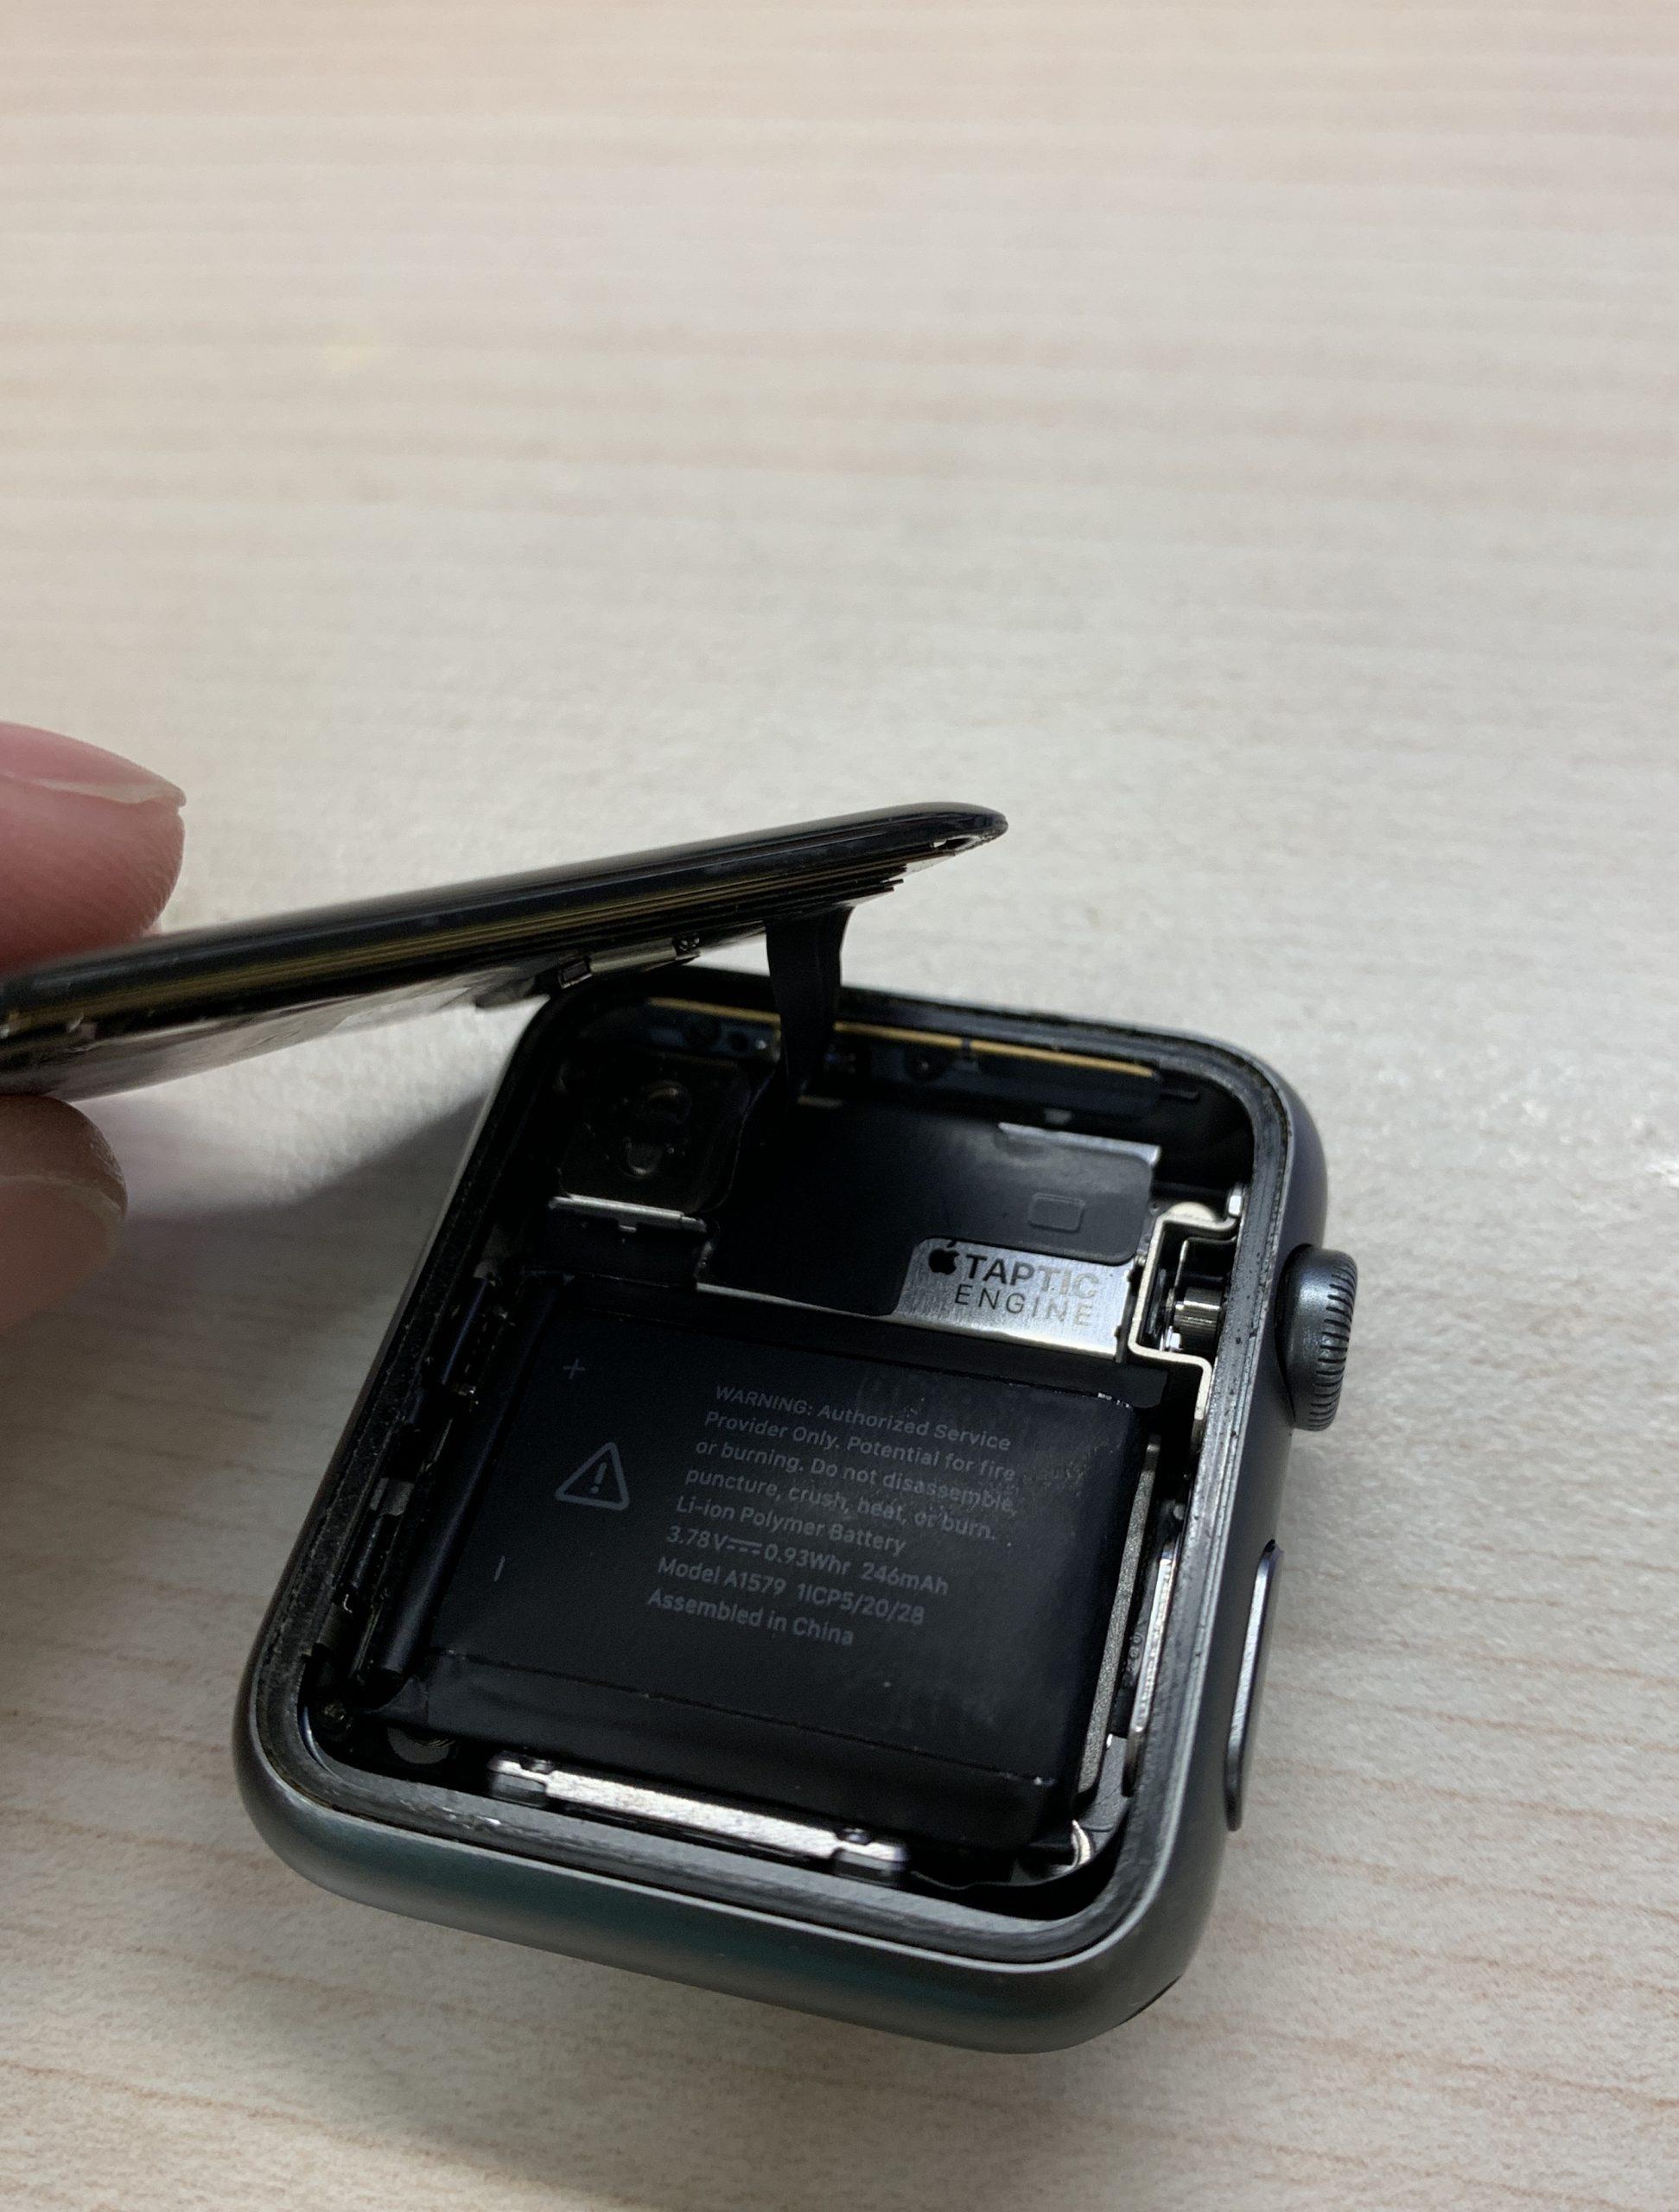 Apple Watch 電池更換三十分鐘快速完修 - 笨鳥慢飛